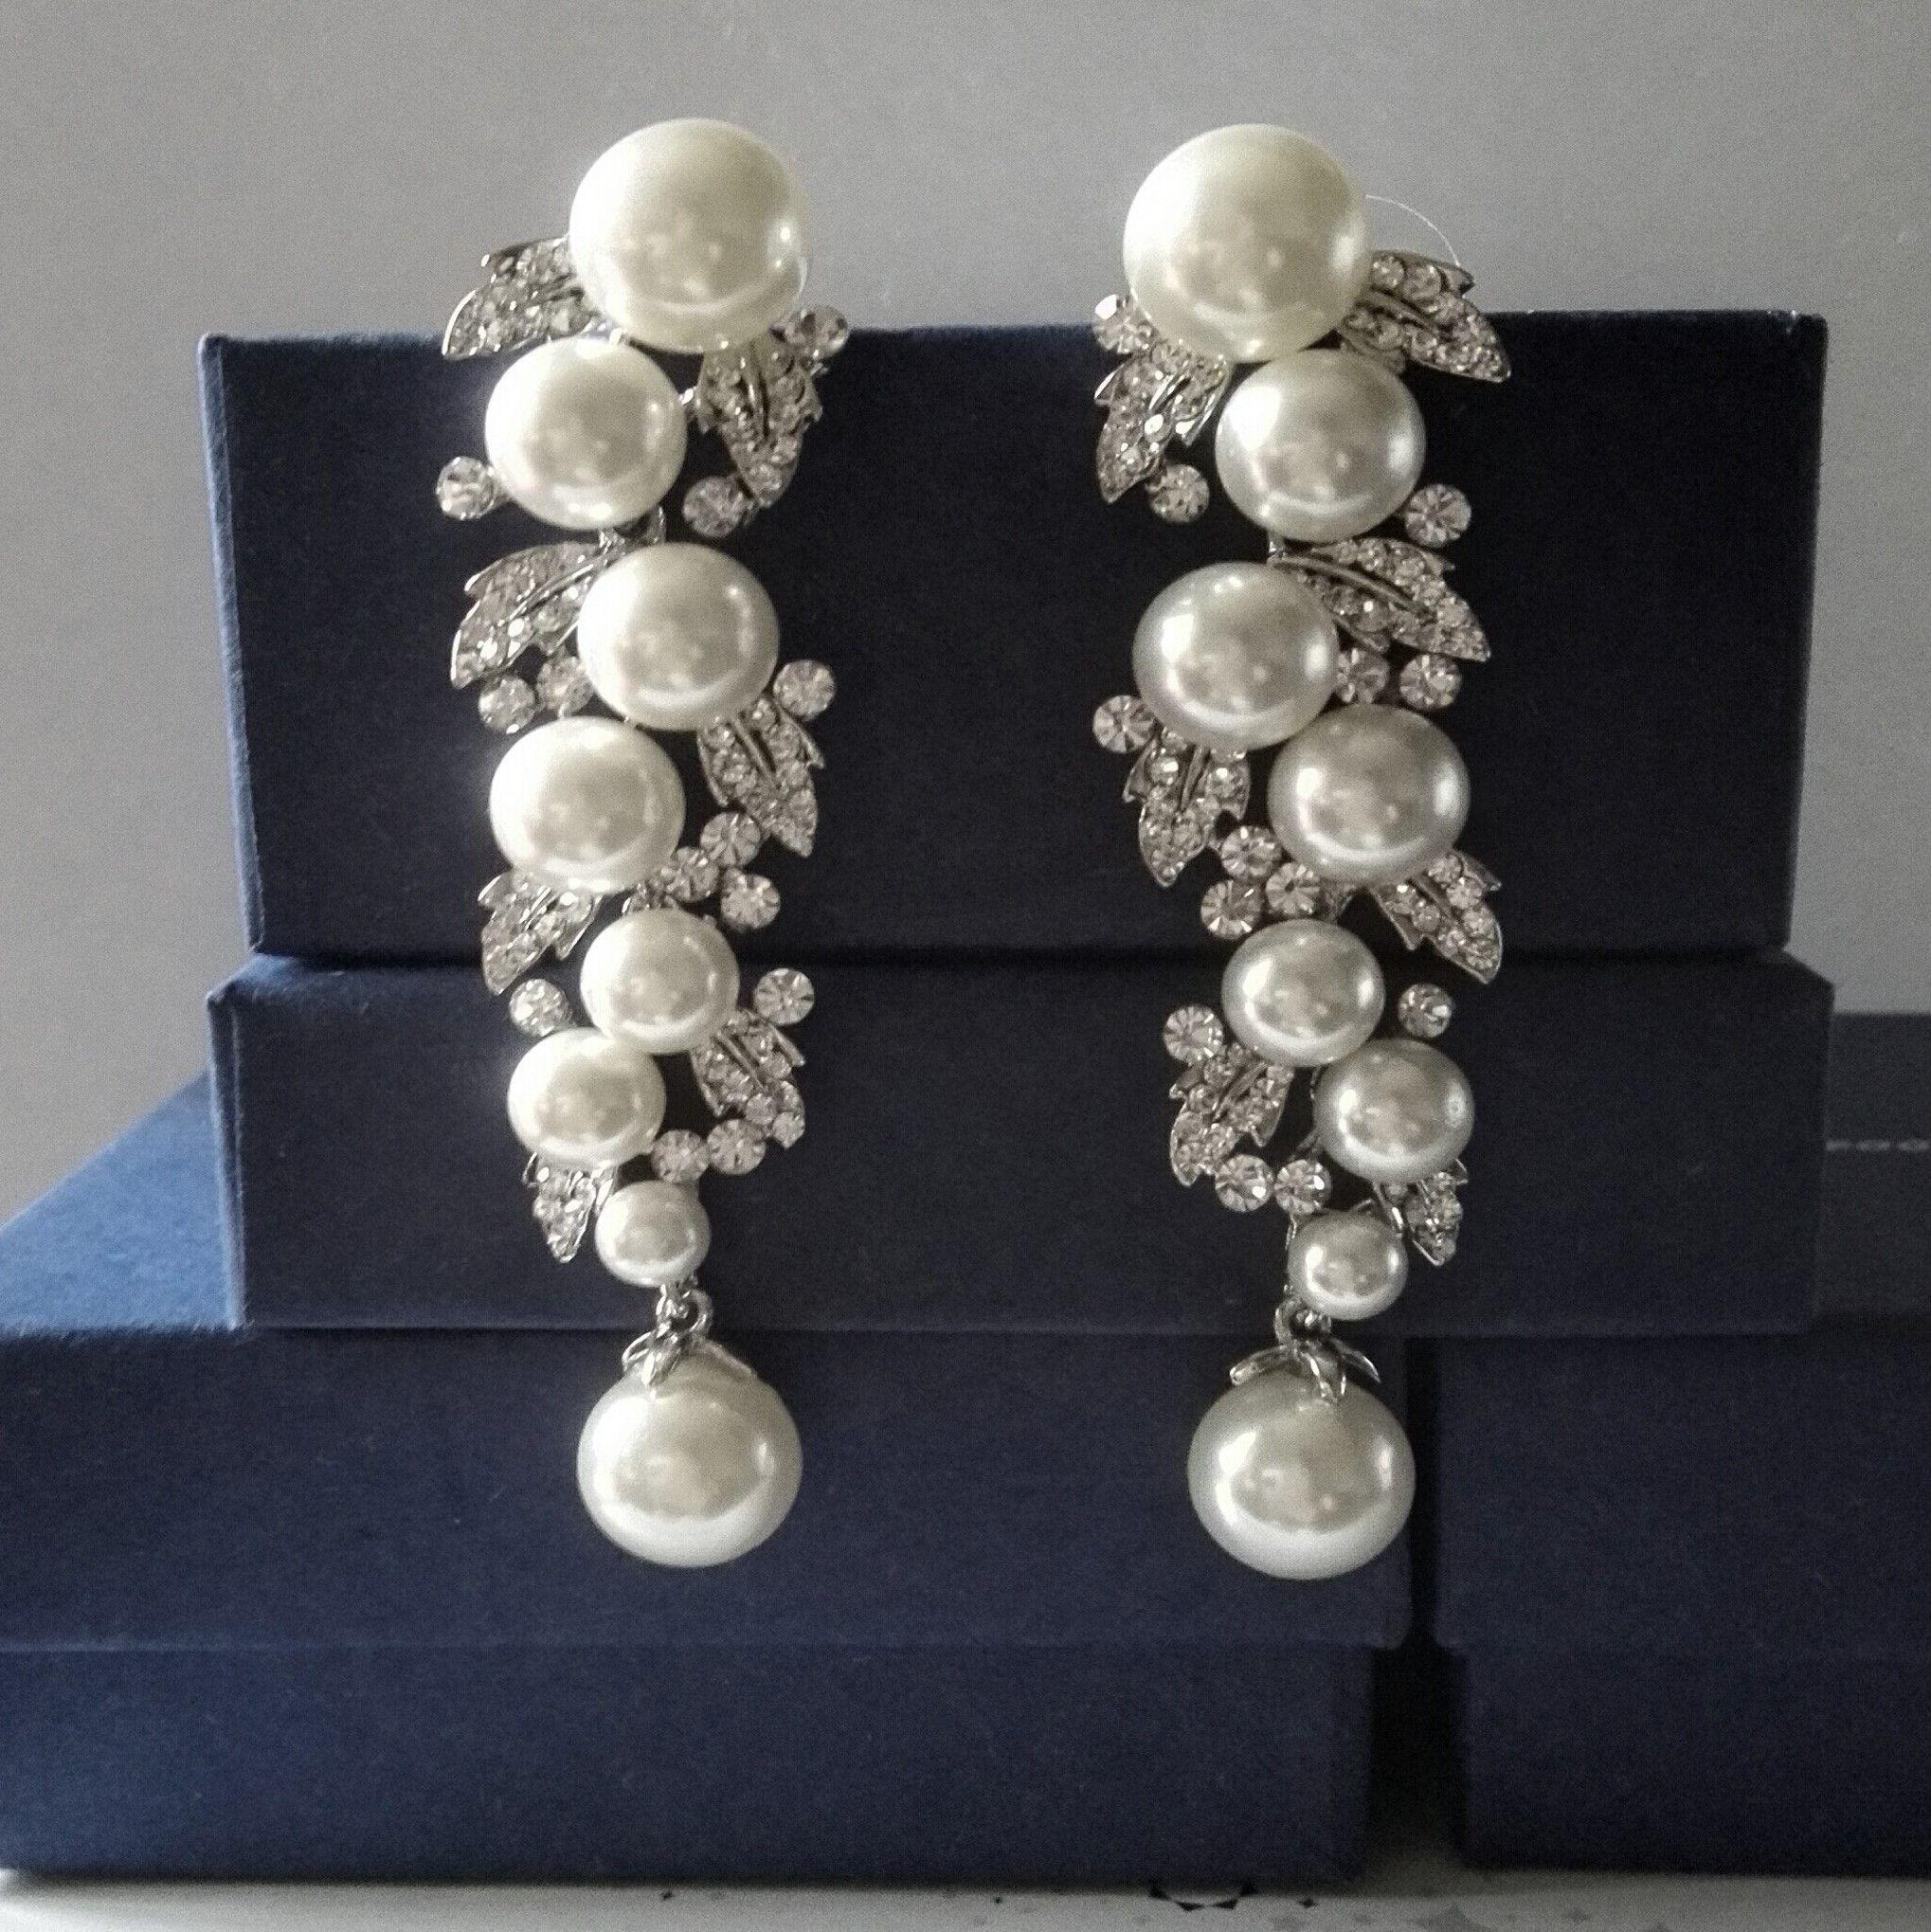 Brown Pearl Chandelier Earrings Uk Free Delivery On